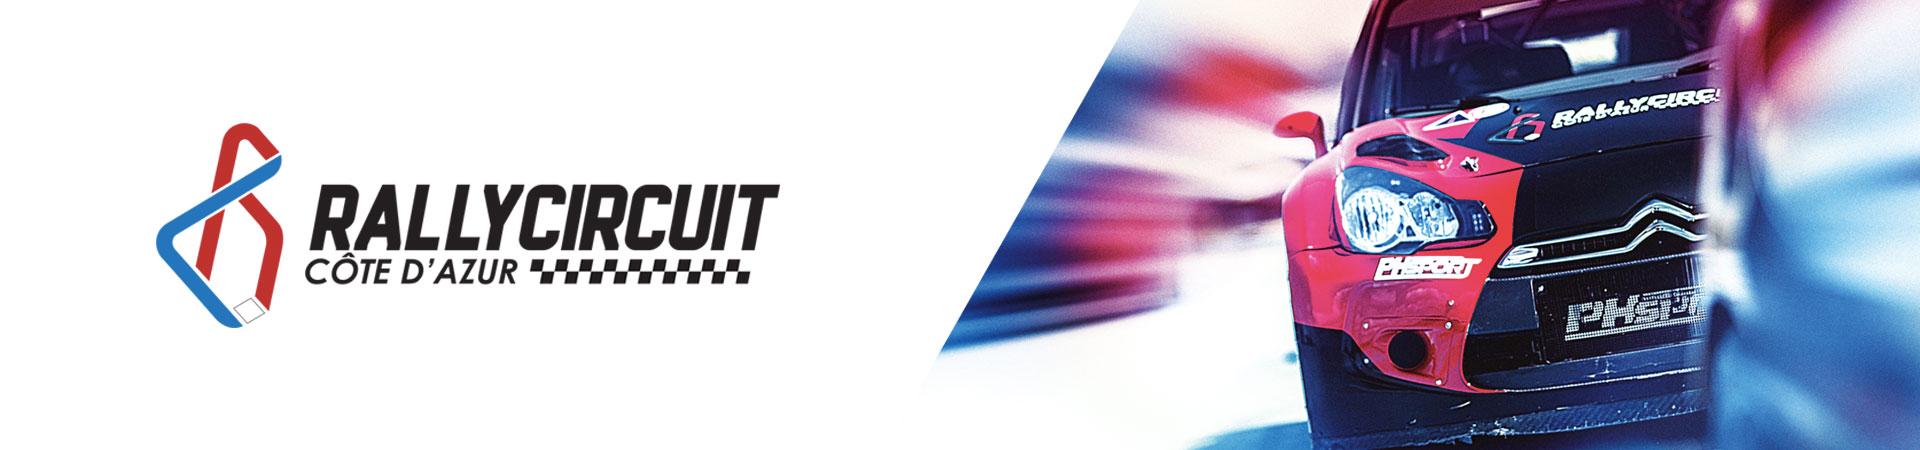 Création logo Rallycircuit - image clé